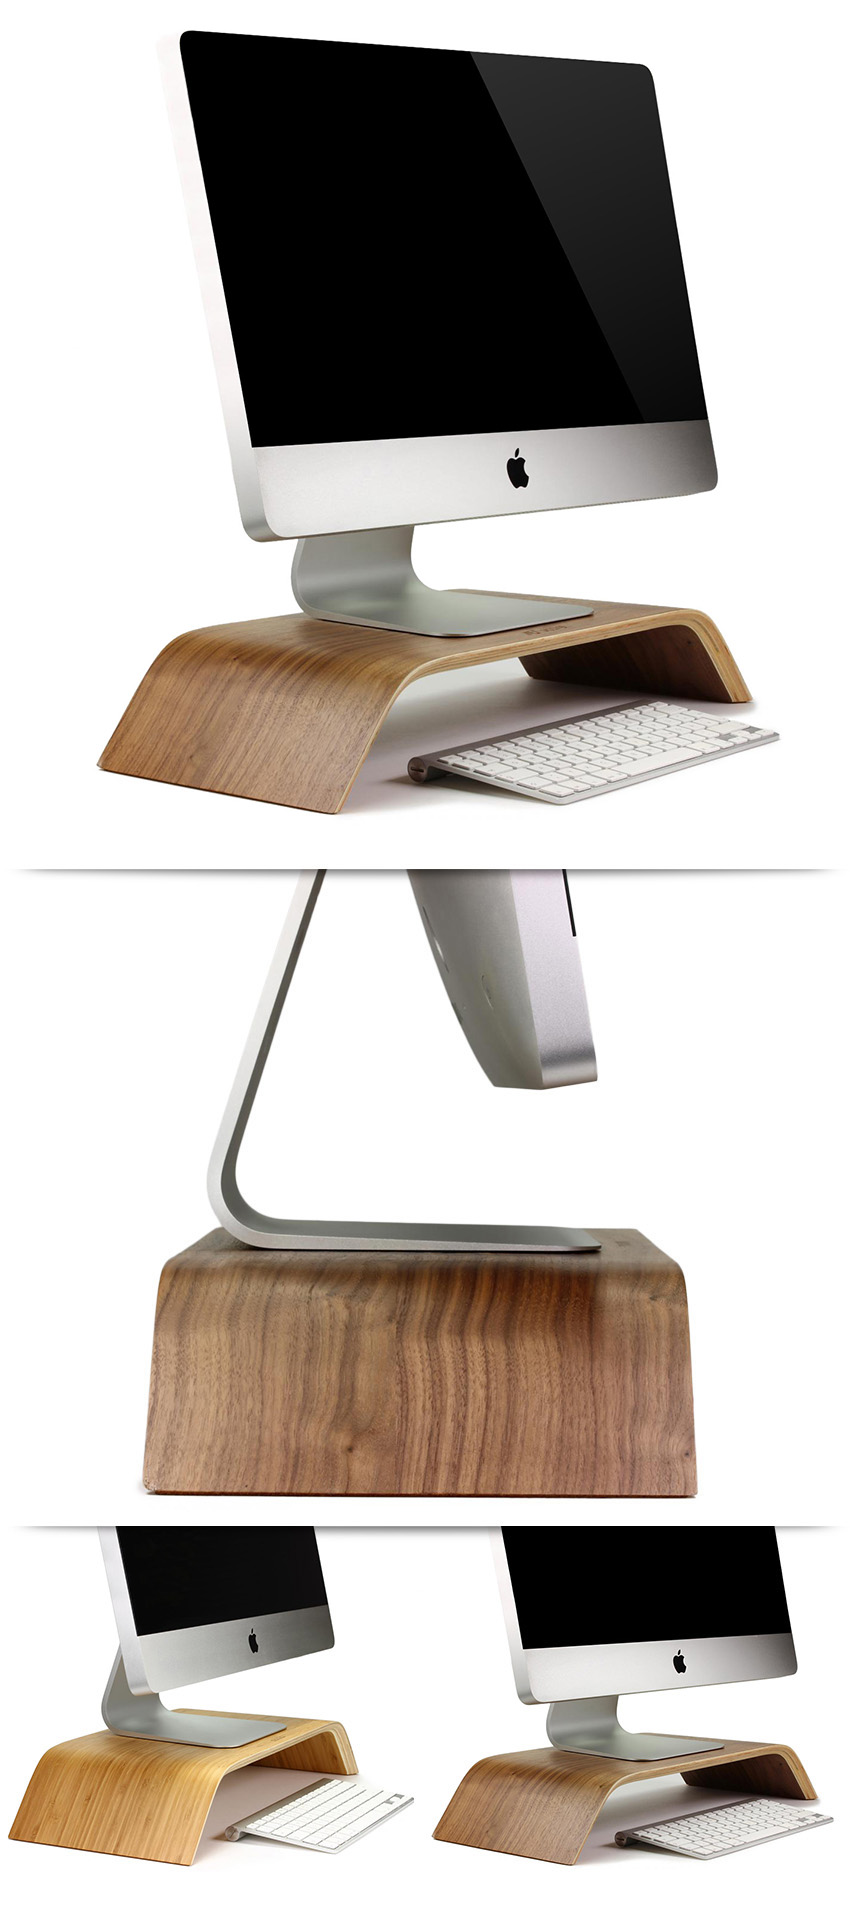 original urcover samdi edit universal bildschirmst nder echt holz dunkelbraun ebay. Black Bedroom Furniture Sets. Home Design Ideas